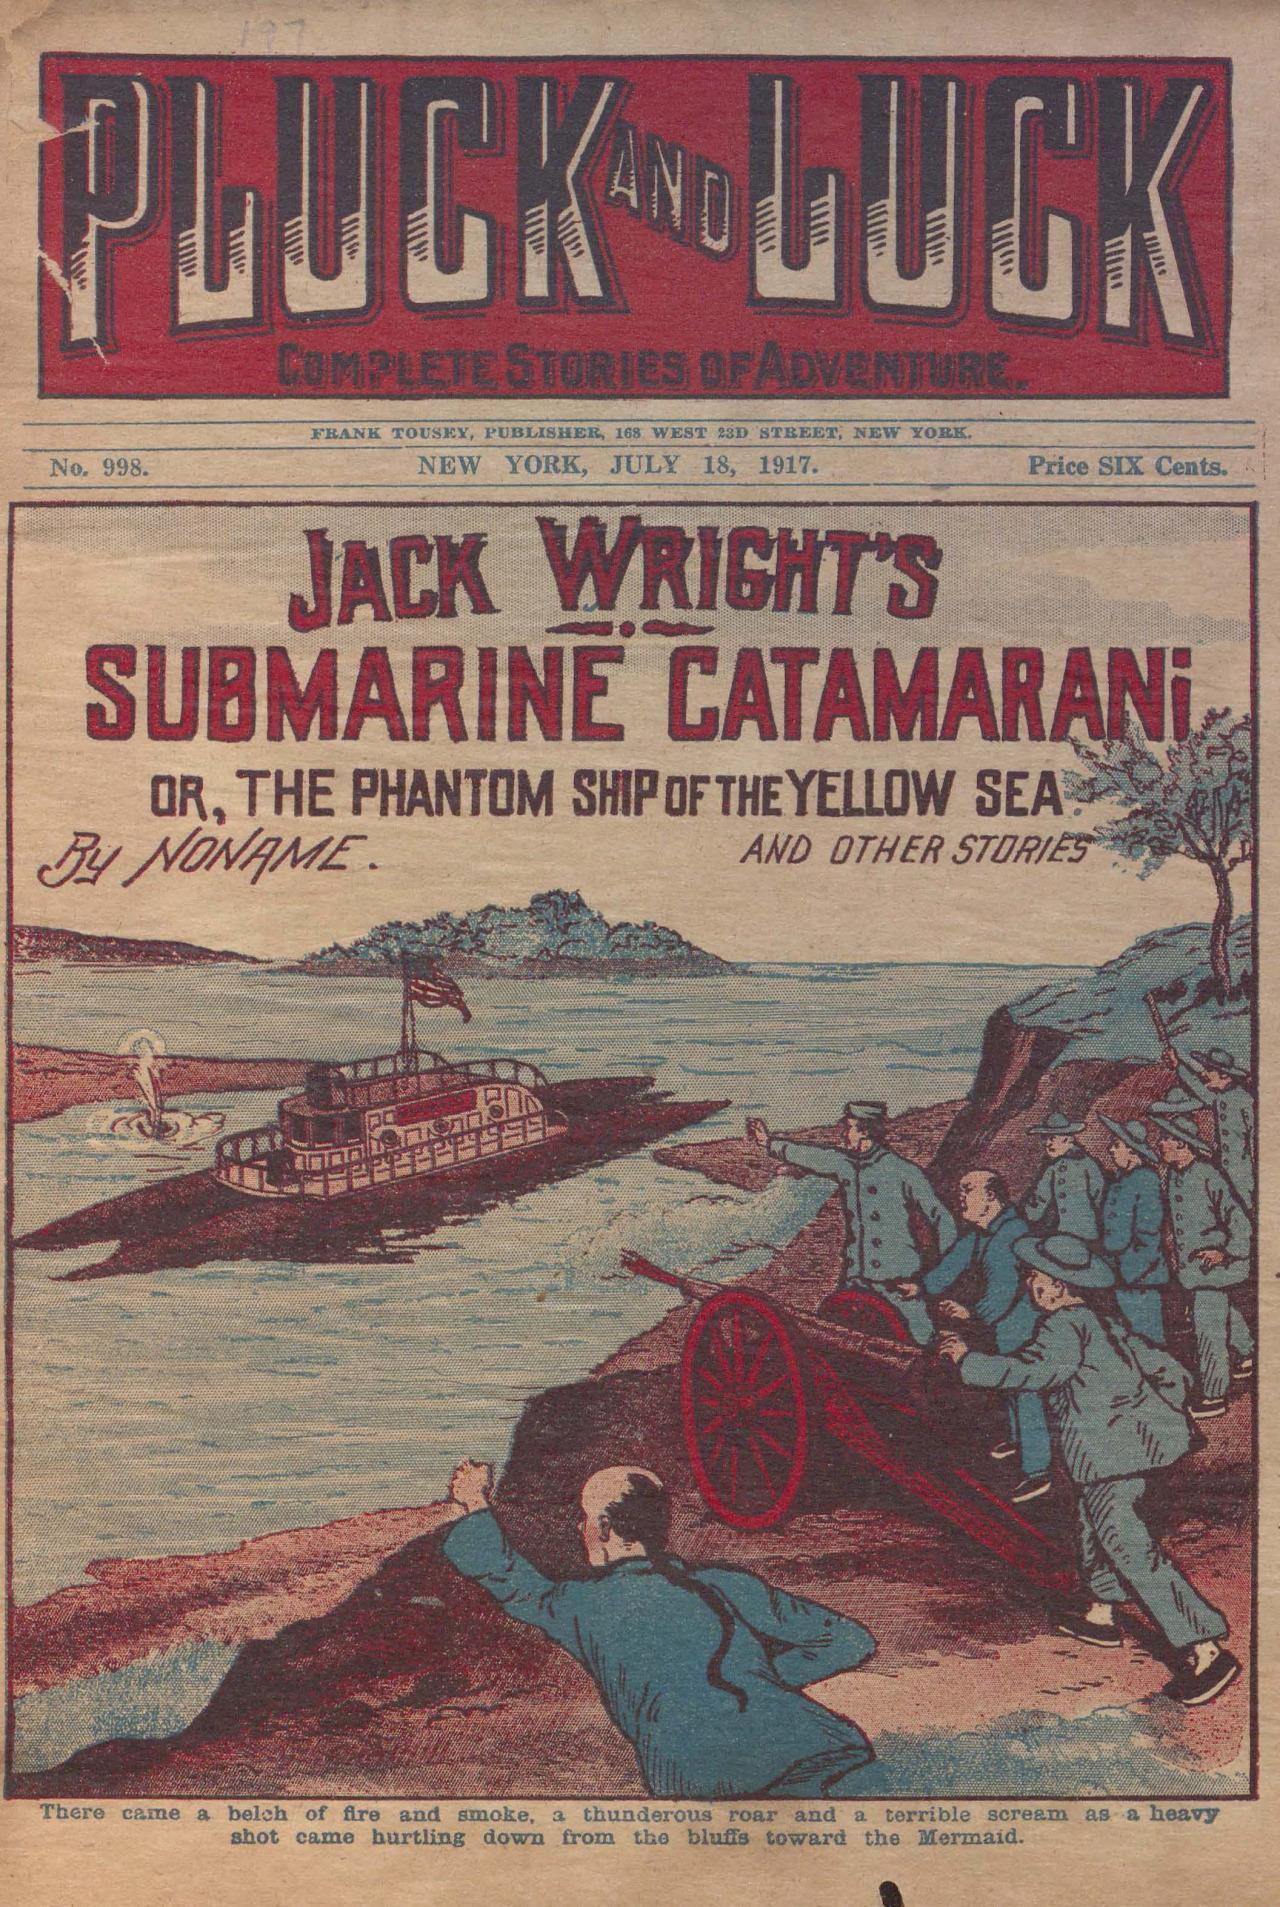 "mermaid ""Jack Wright's Submarine Catamarani; or, The Phamtom Ship of the Yellow Sea"", Pluck and Puck No. 998, July 18, 1917"